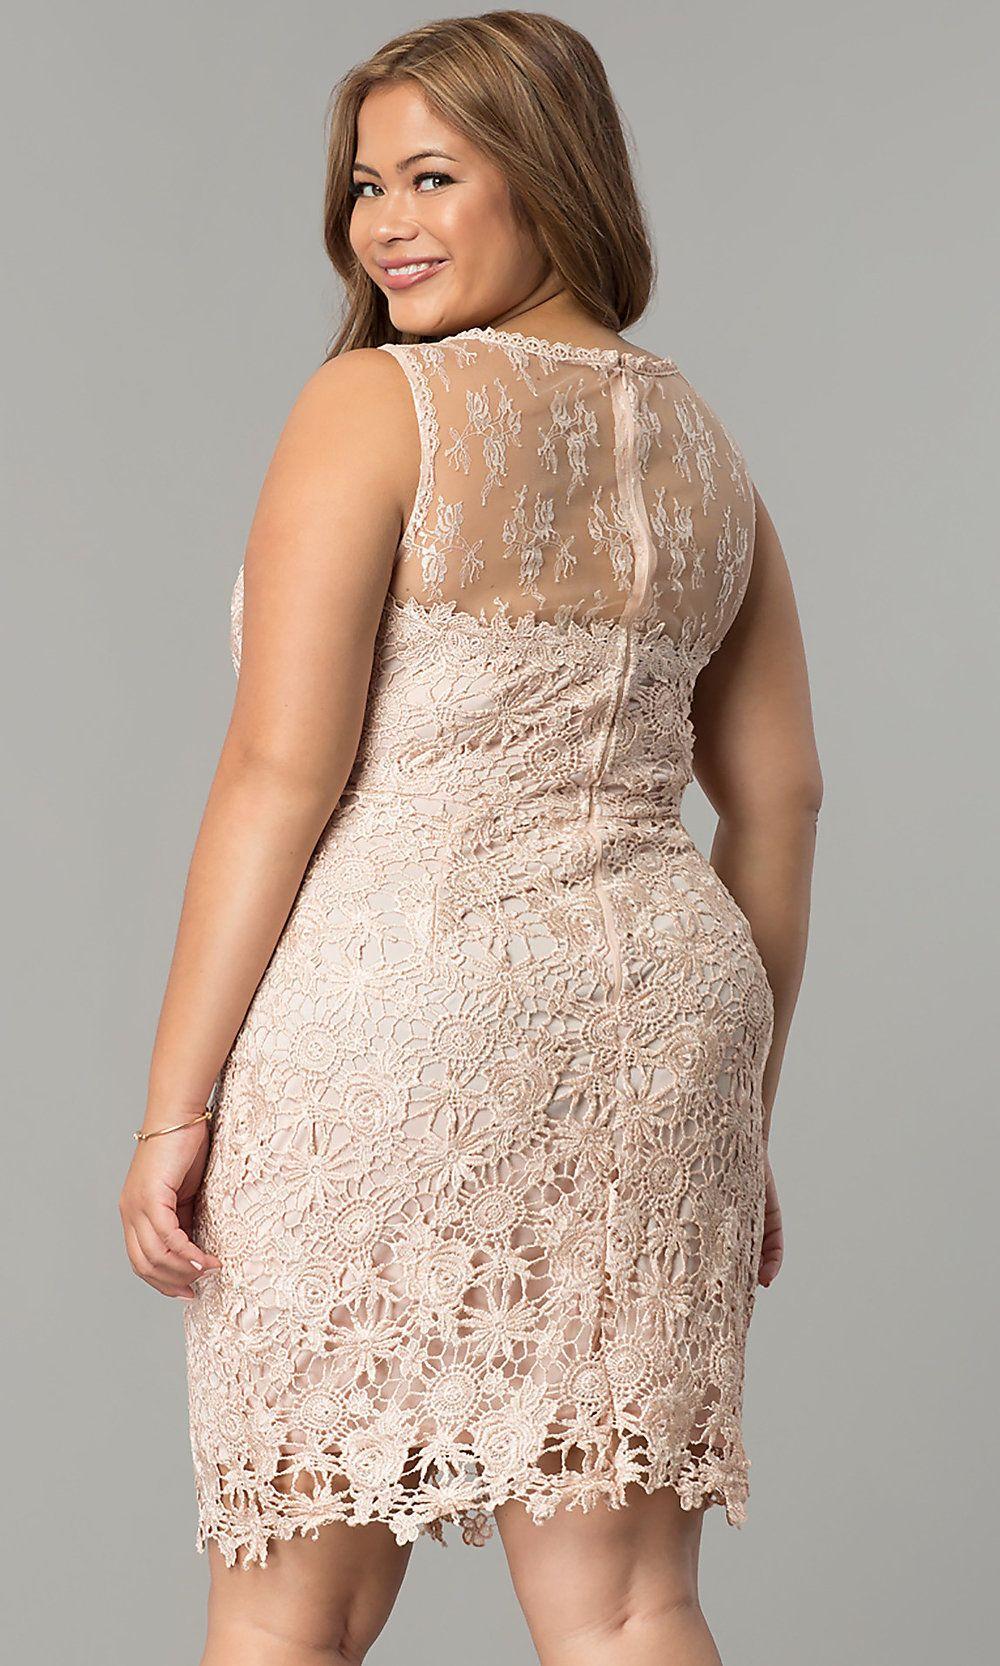 Short Lace PlusSize WeddingGuest Party Dress in 2020